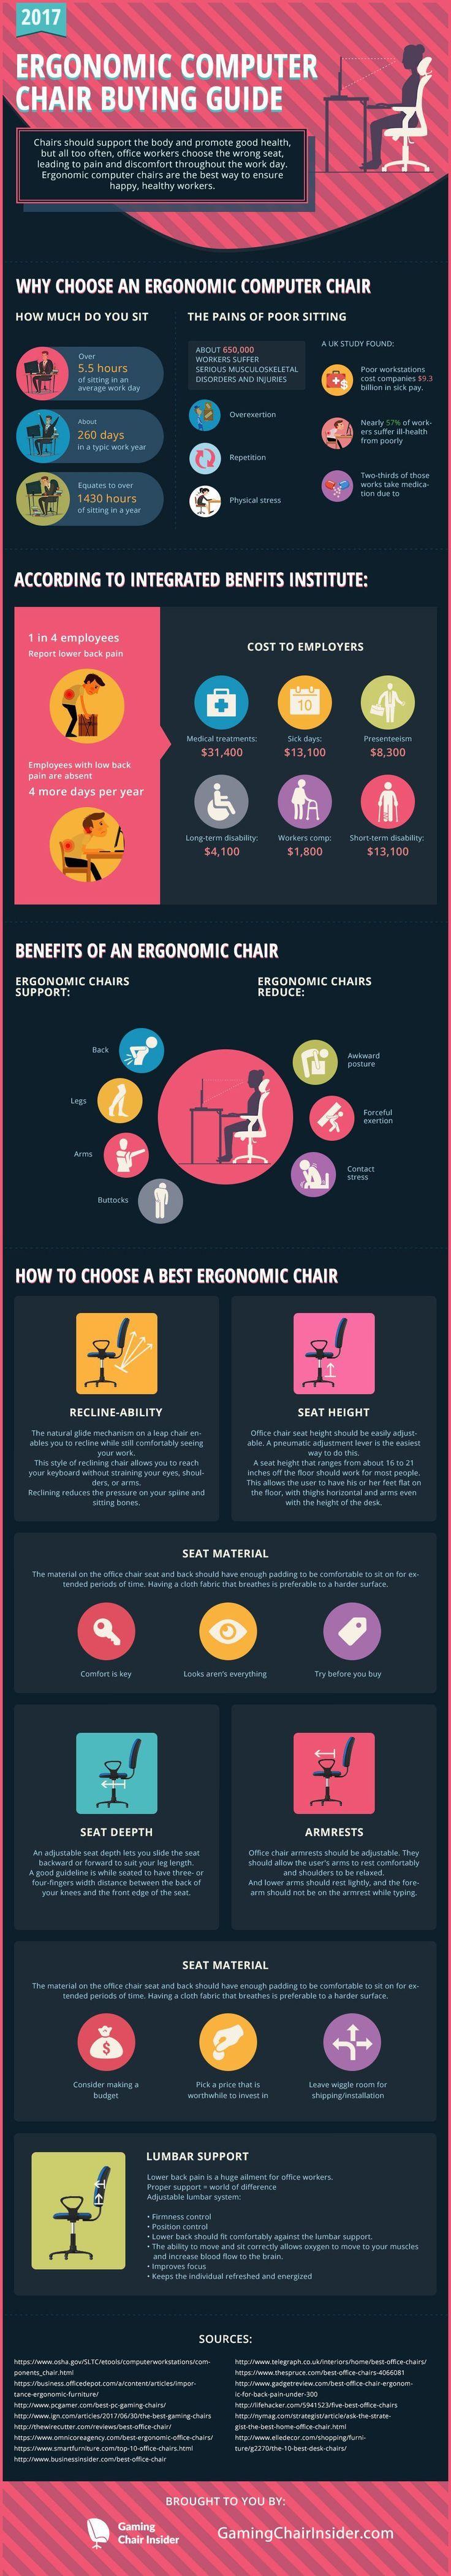 Ergonomic Computer Chair Buying Guide #Infographic #ComputerChair #homeimprovementguide, #ergonomicofficechairfurniture